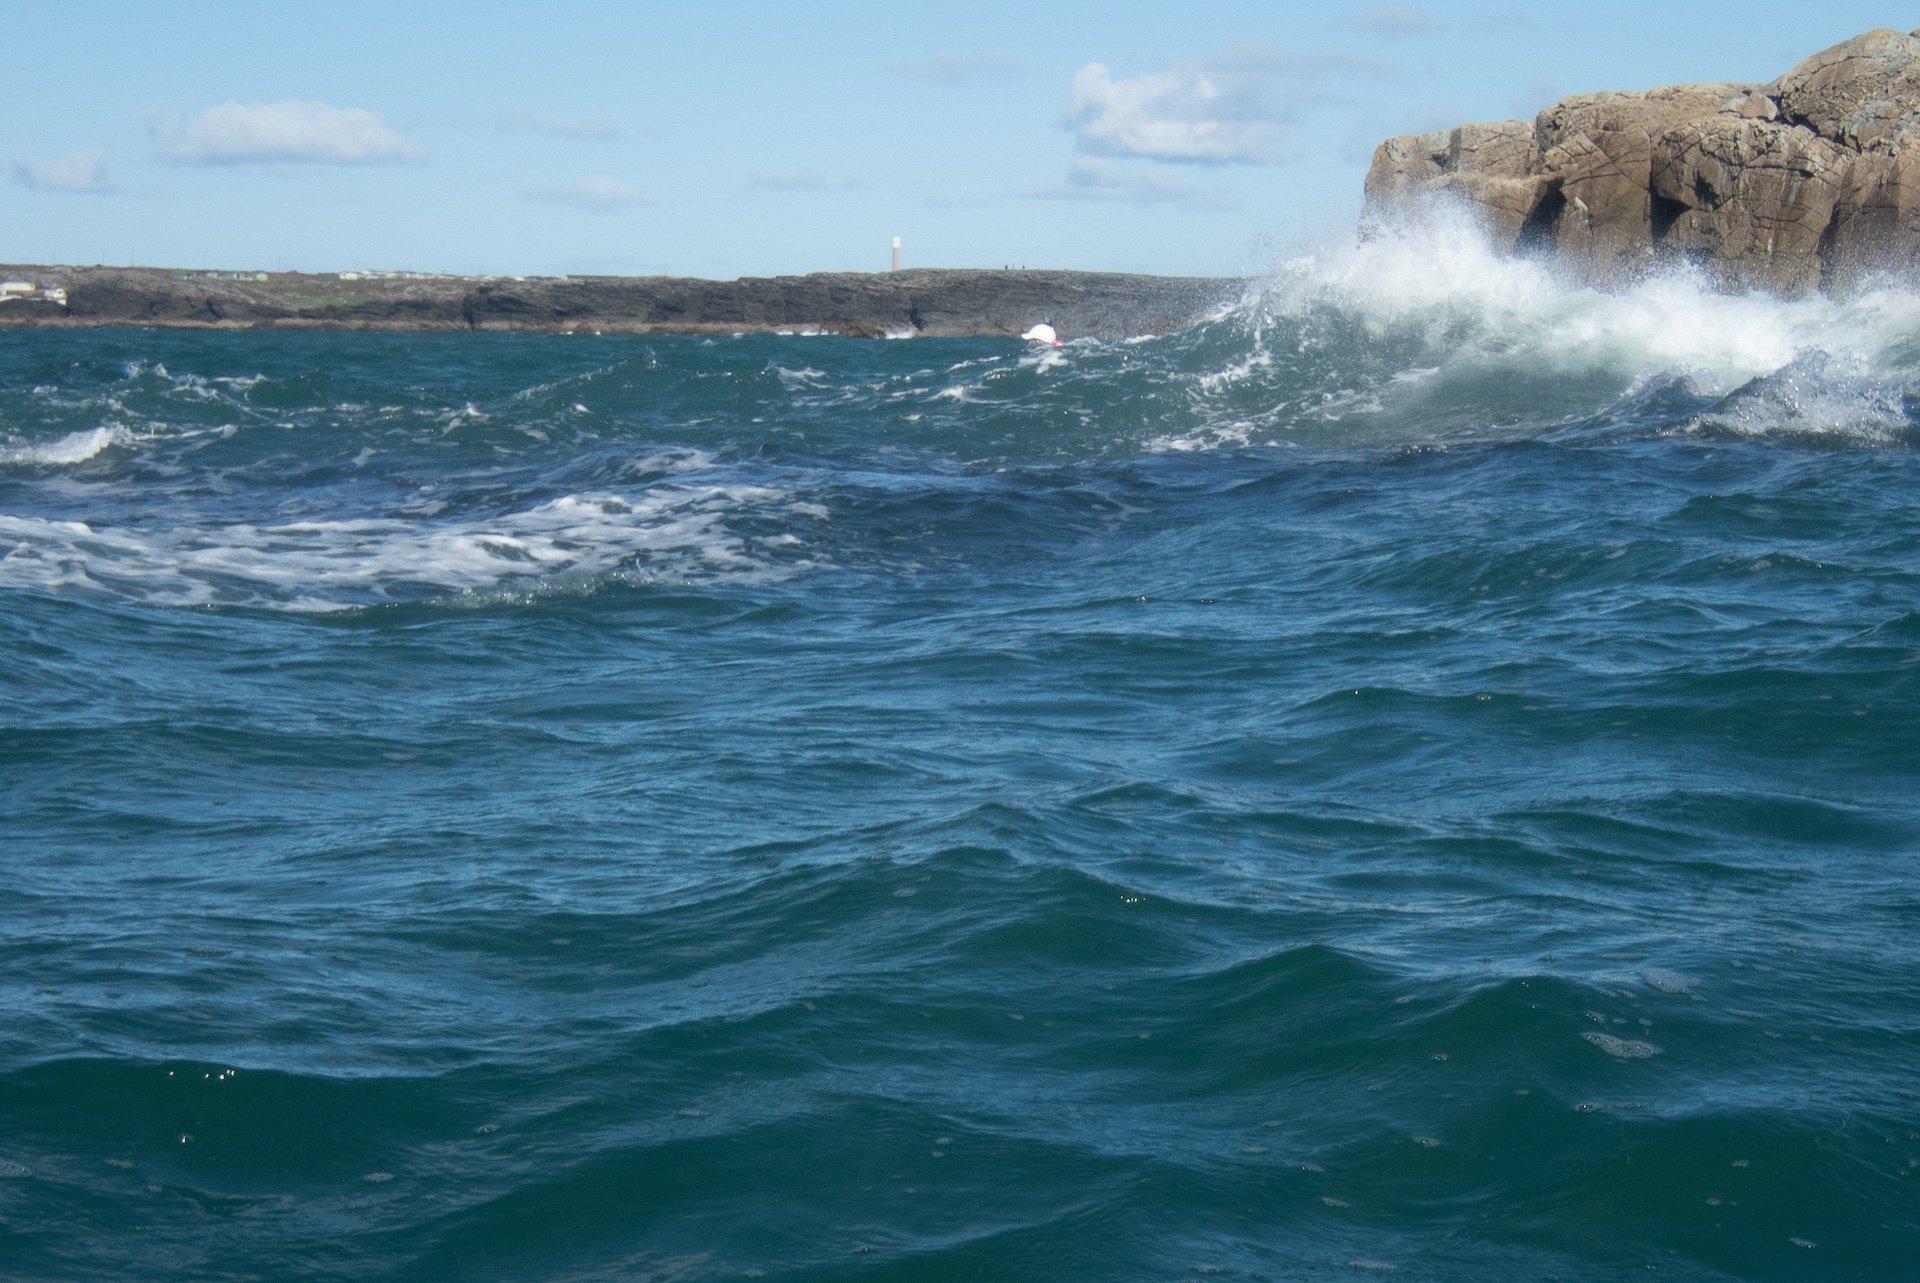 Big wave rock avoidance